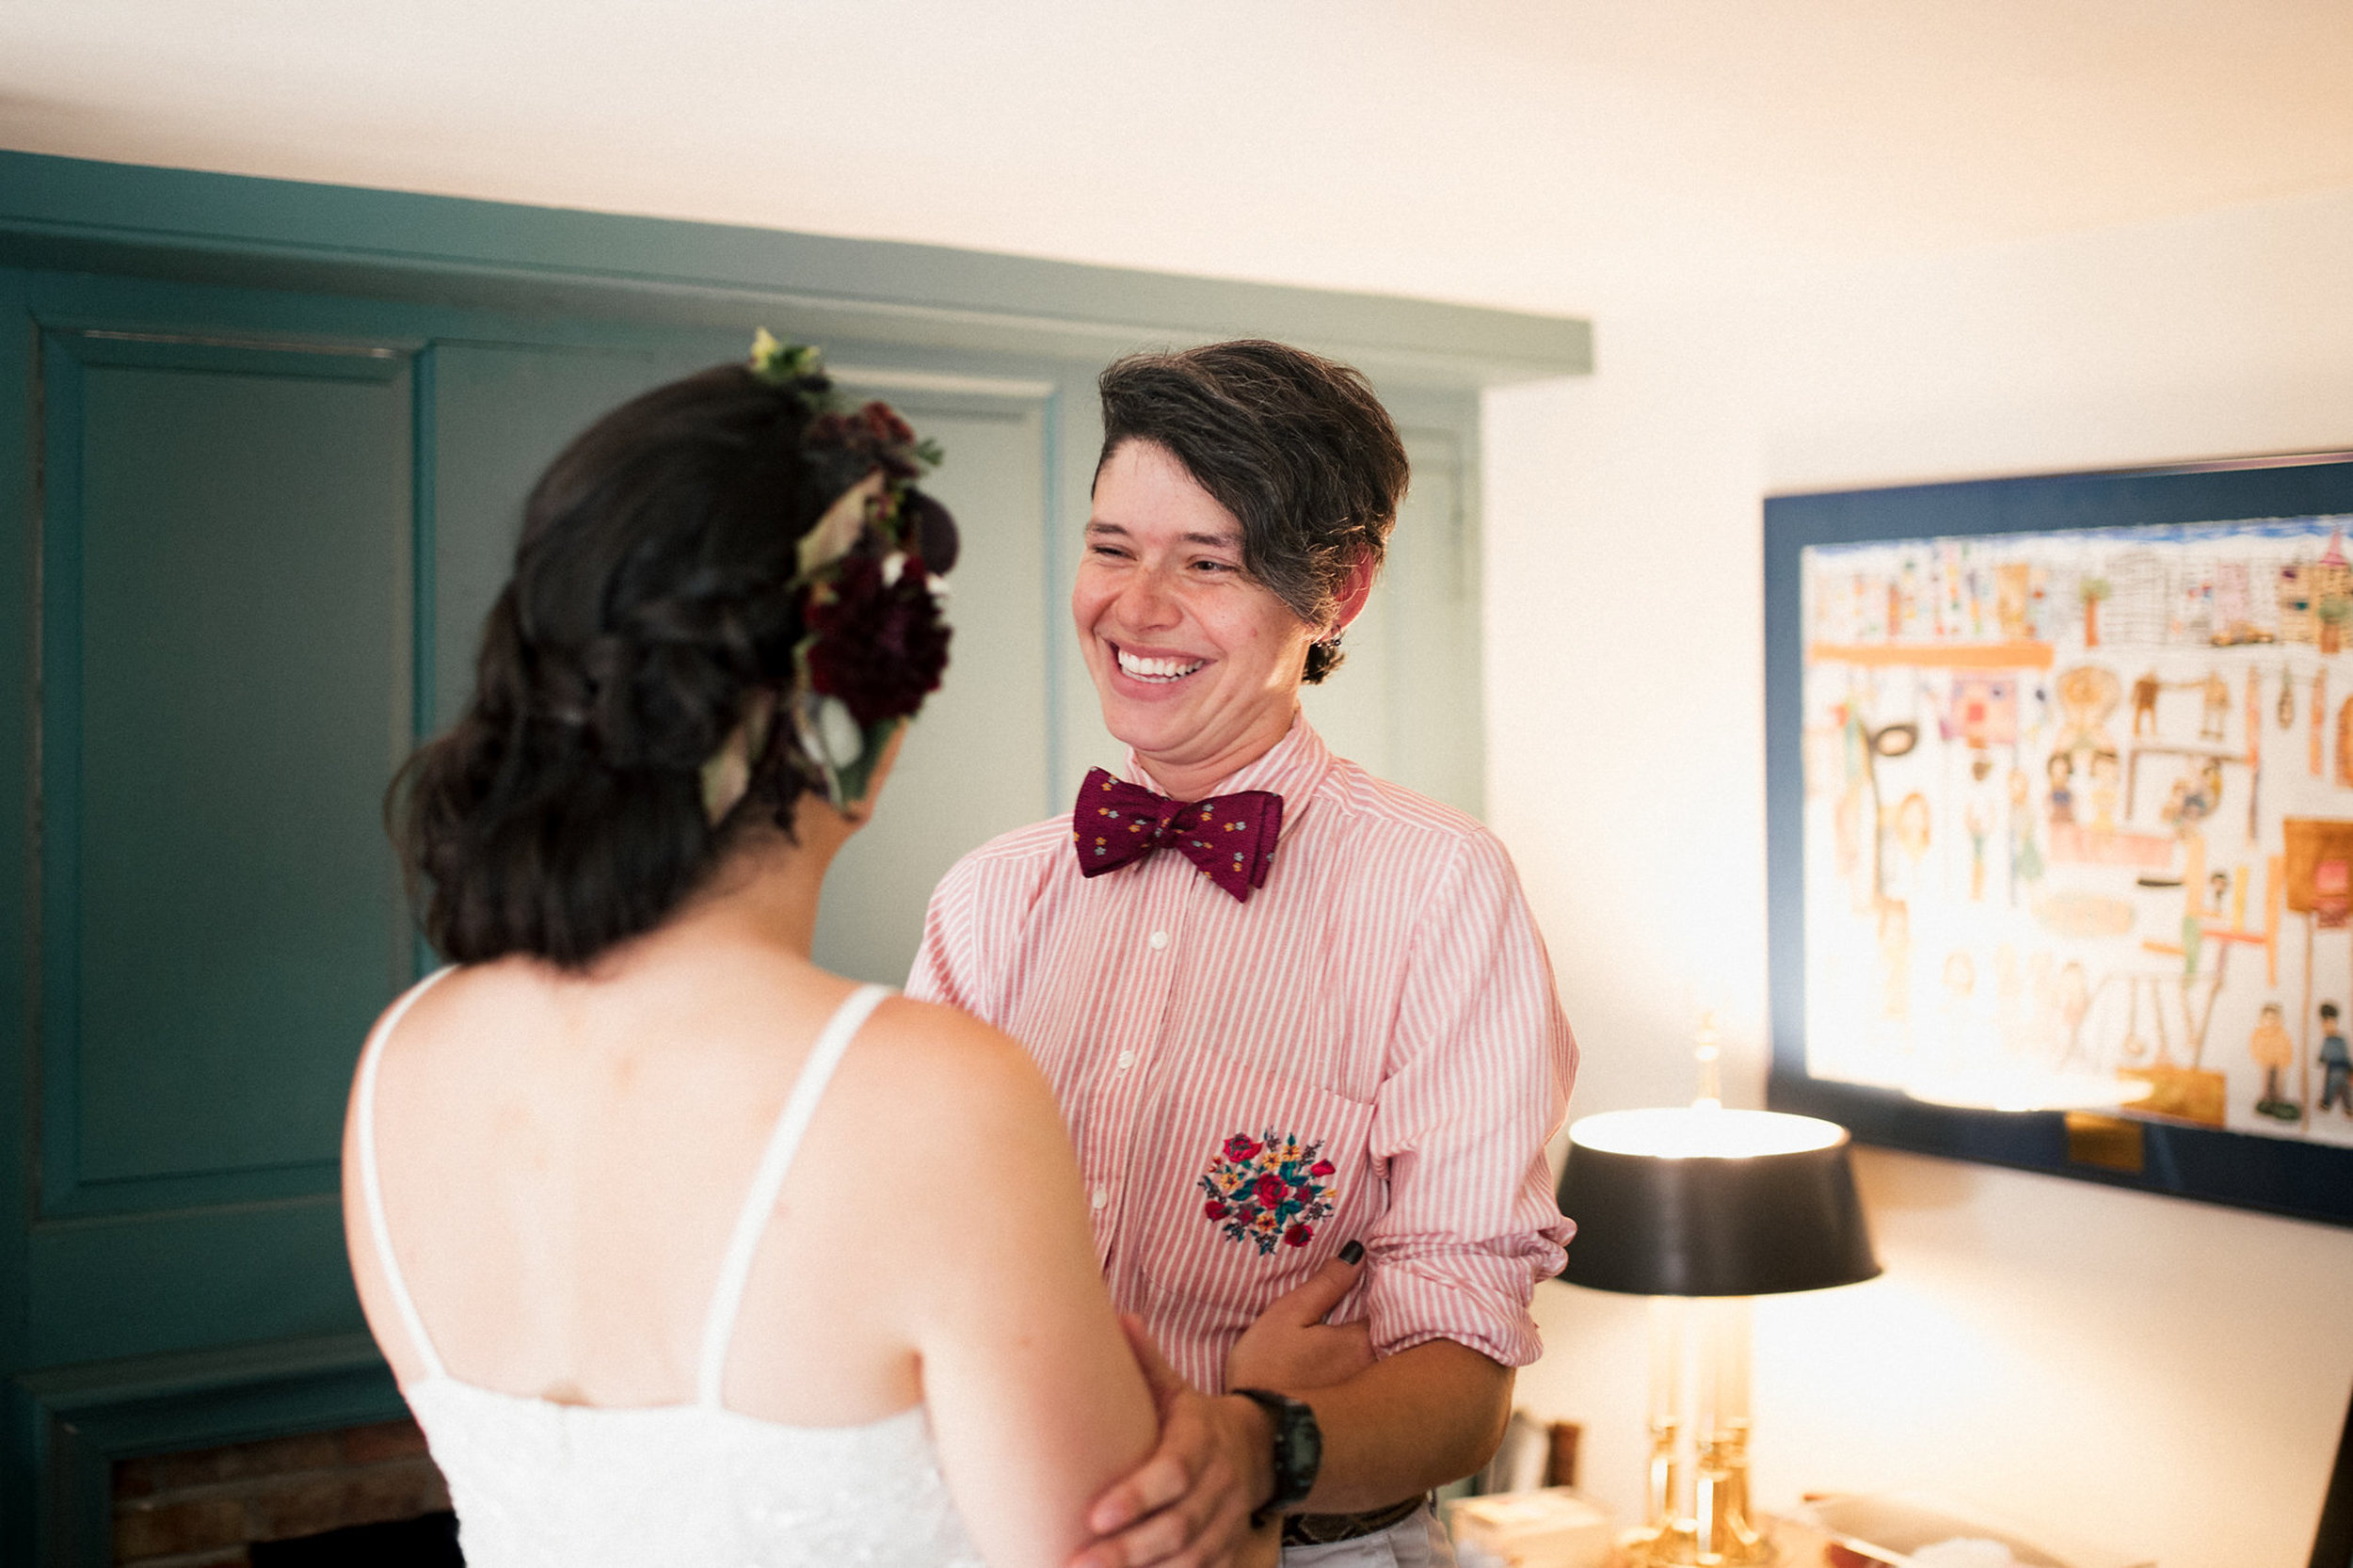 boston_wedding_photographer-16.jpg